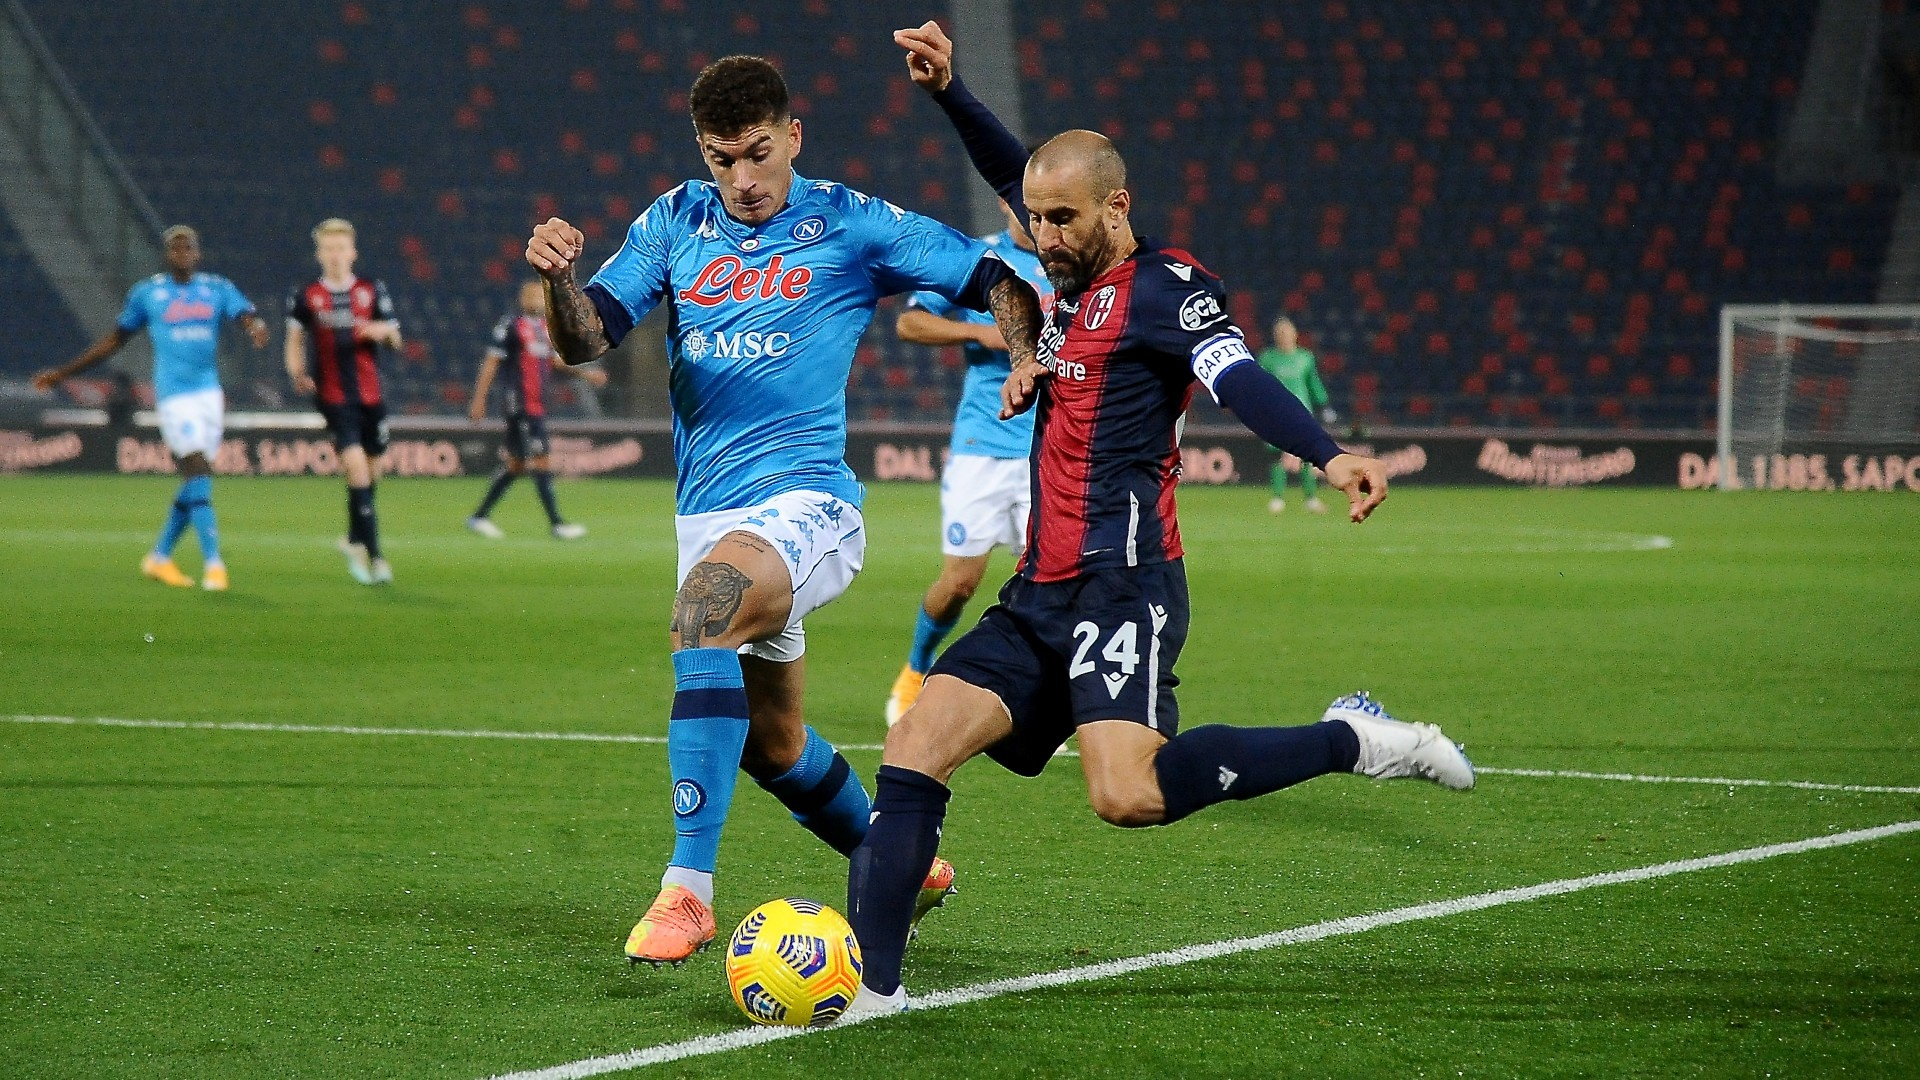 Watch Bologna v Napoli Live Stream | DAZN DE